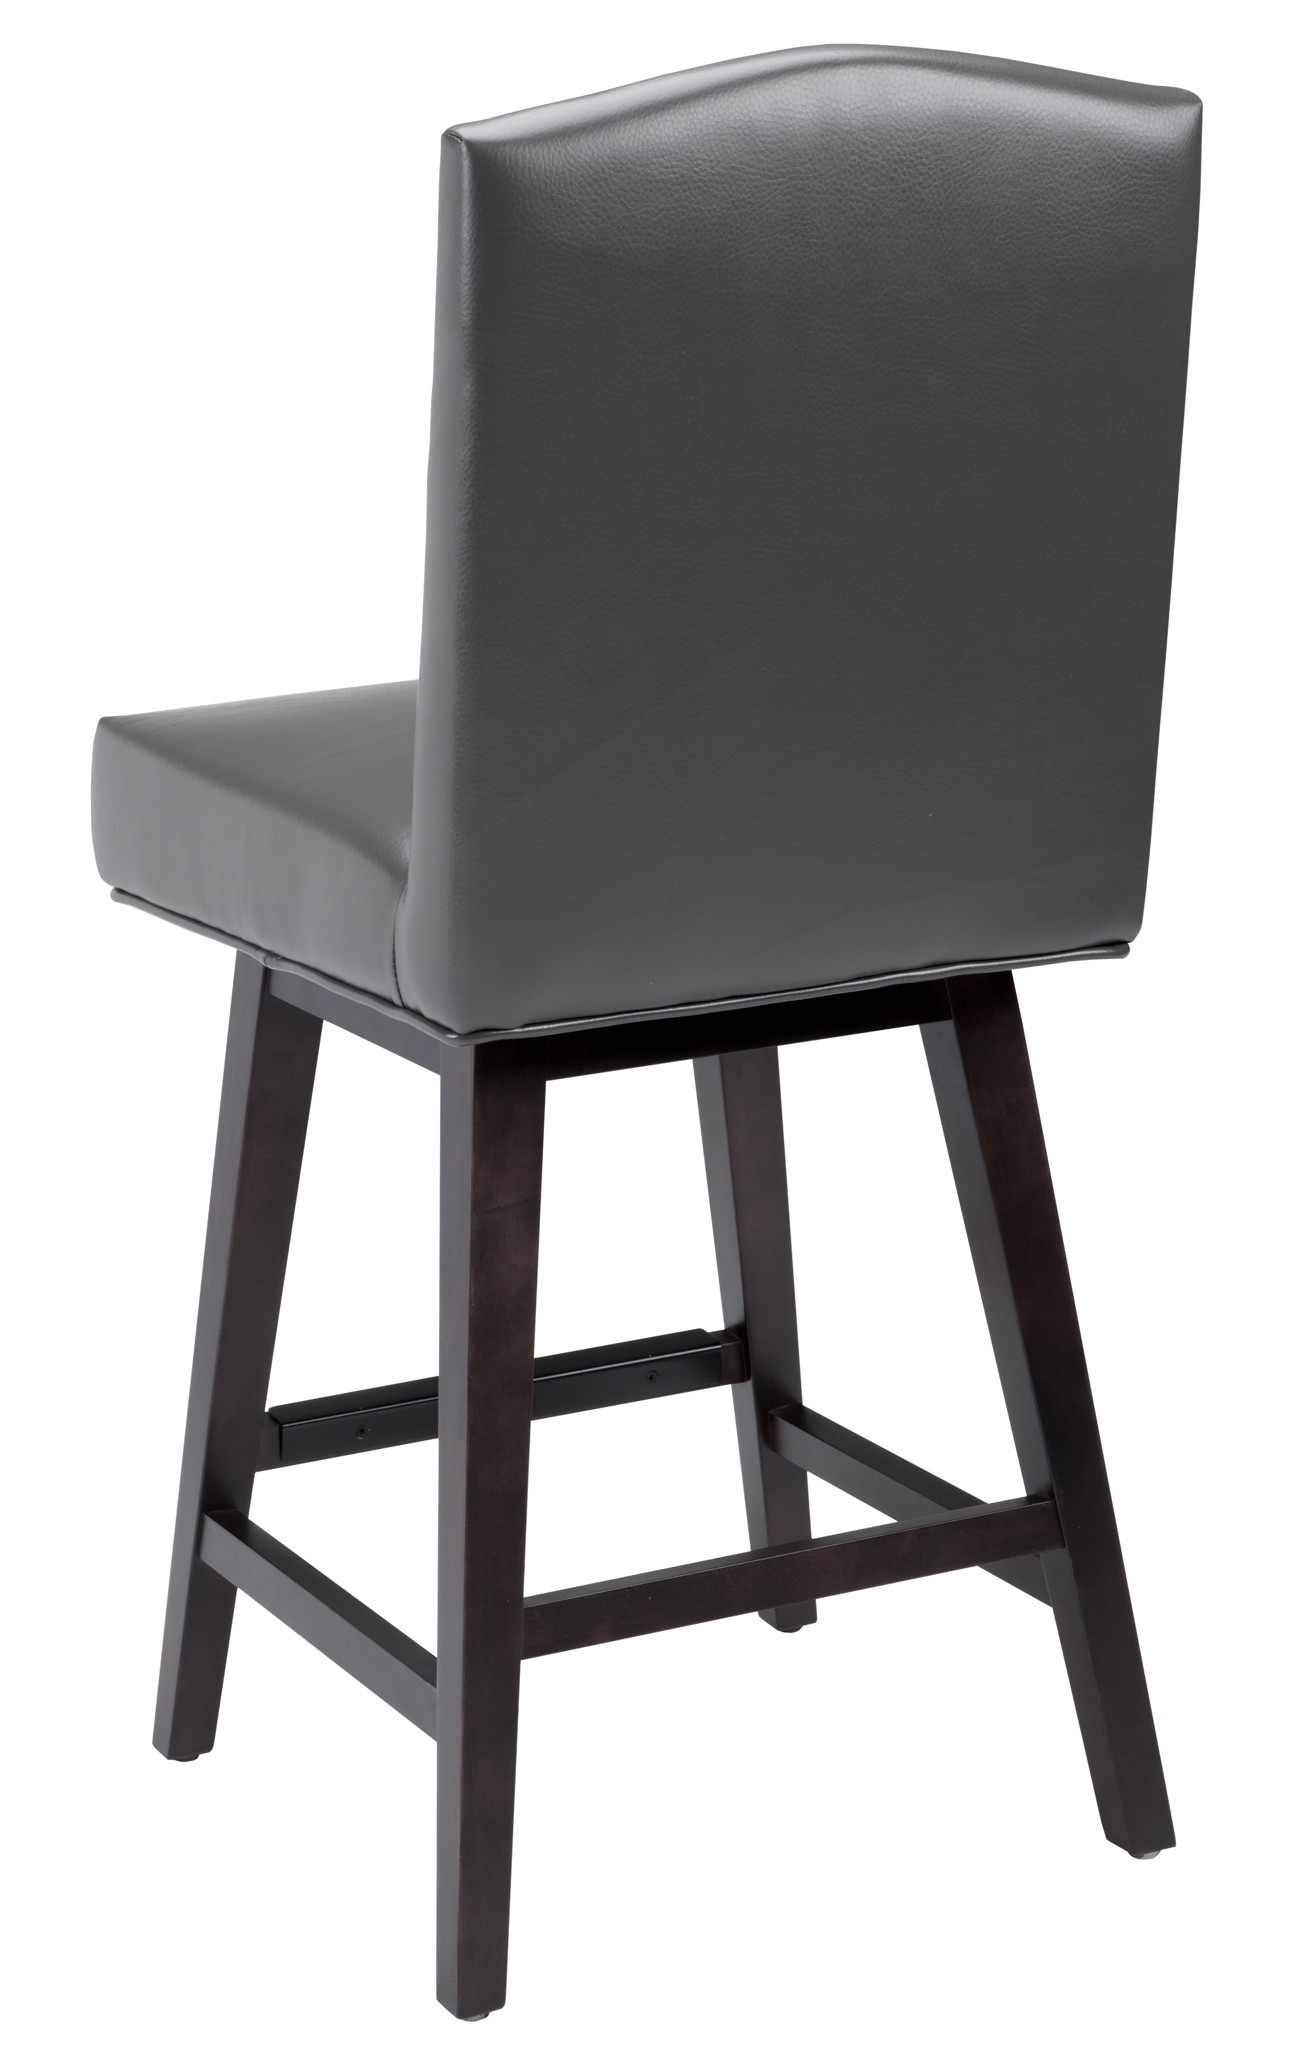 Maison Grey Swivel Counter Stool From Sunpan 73018